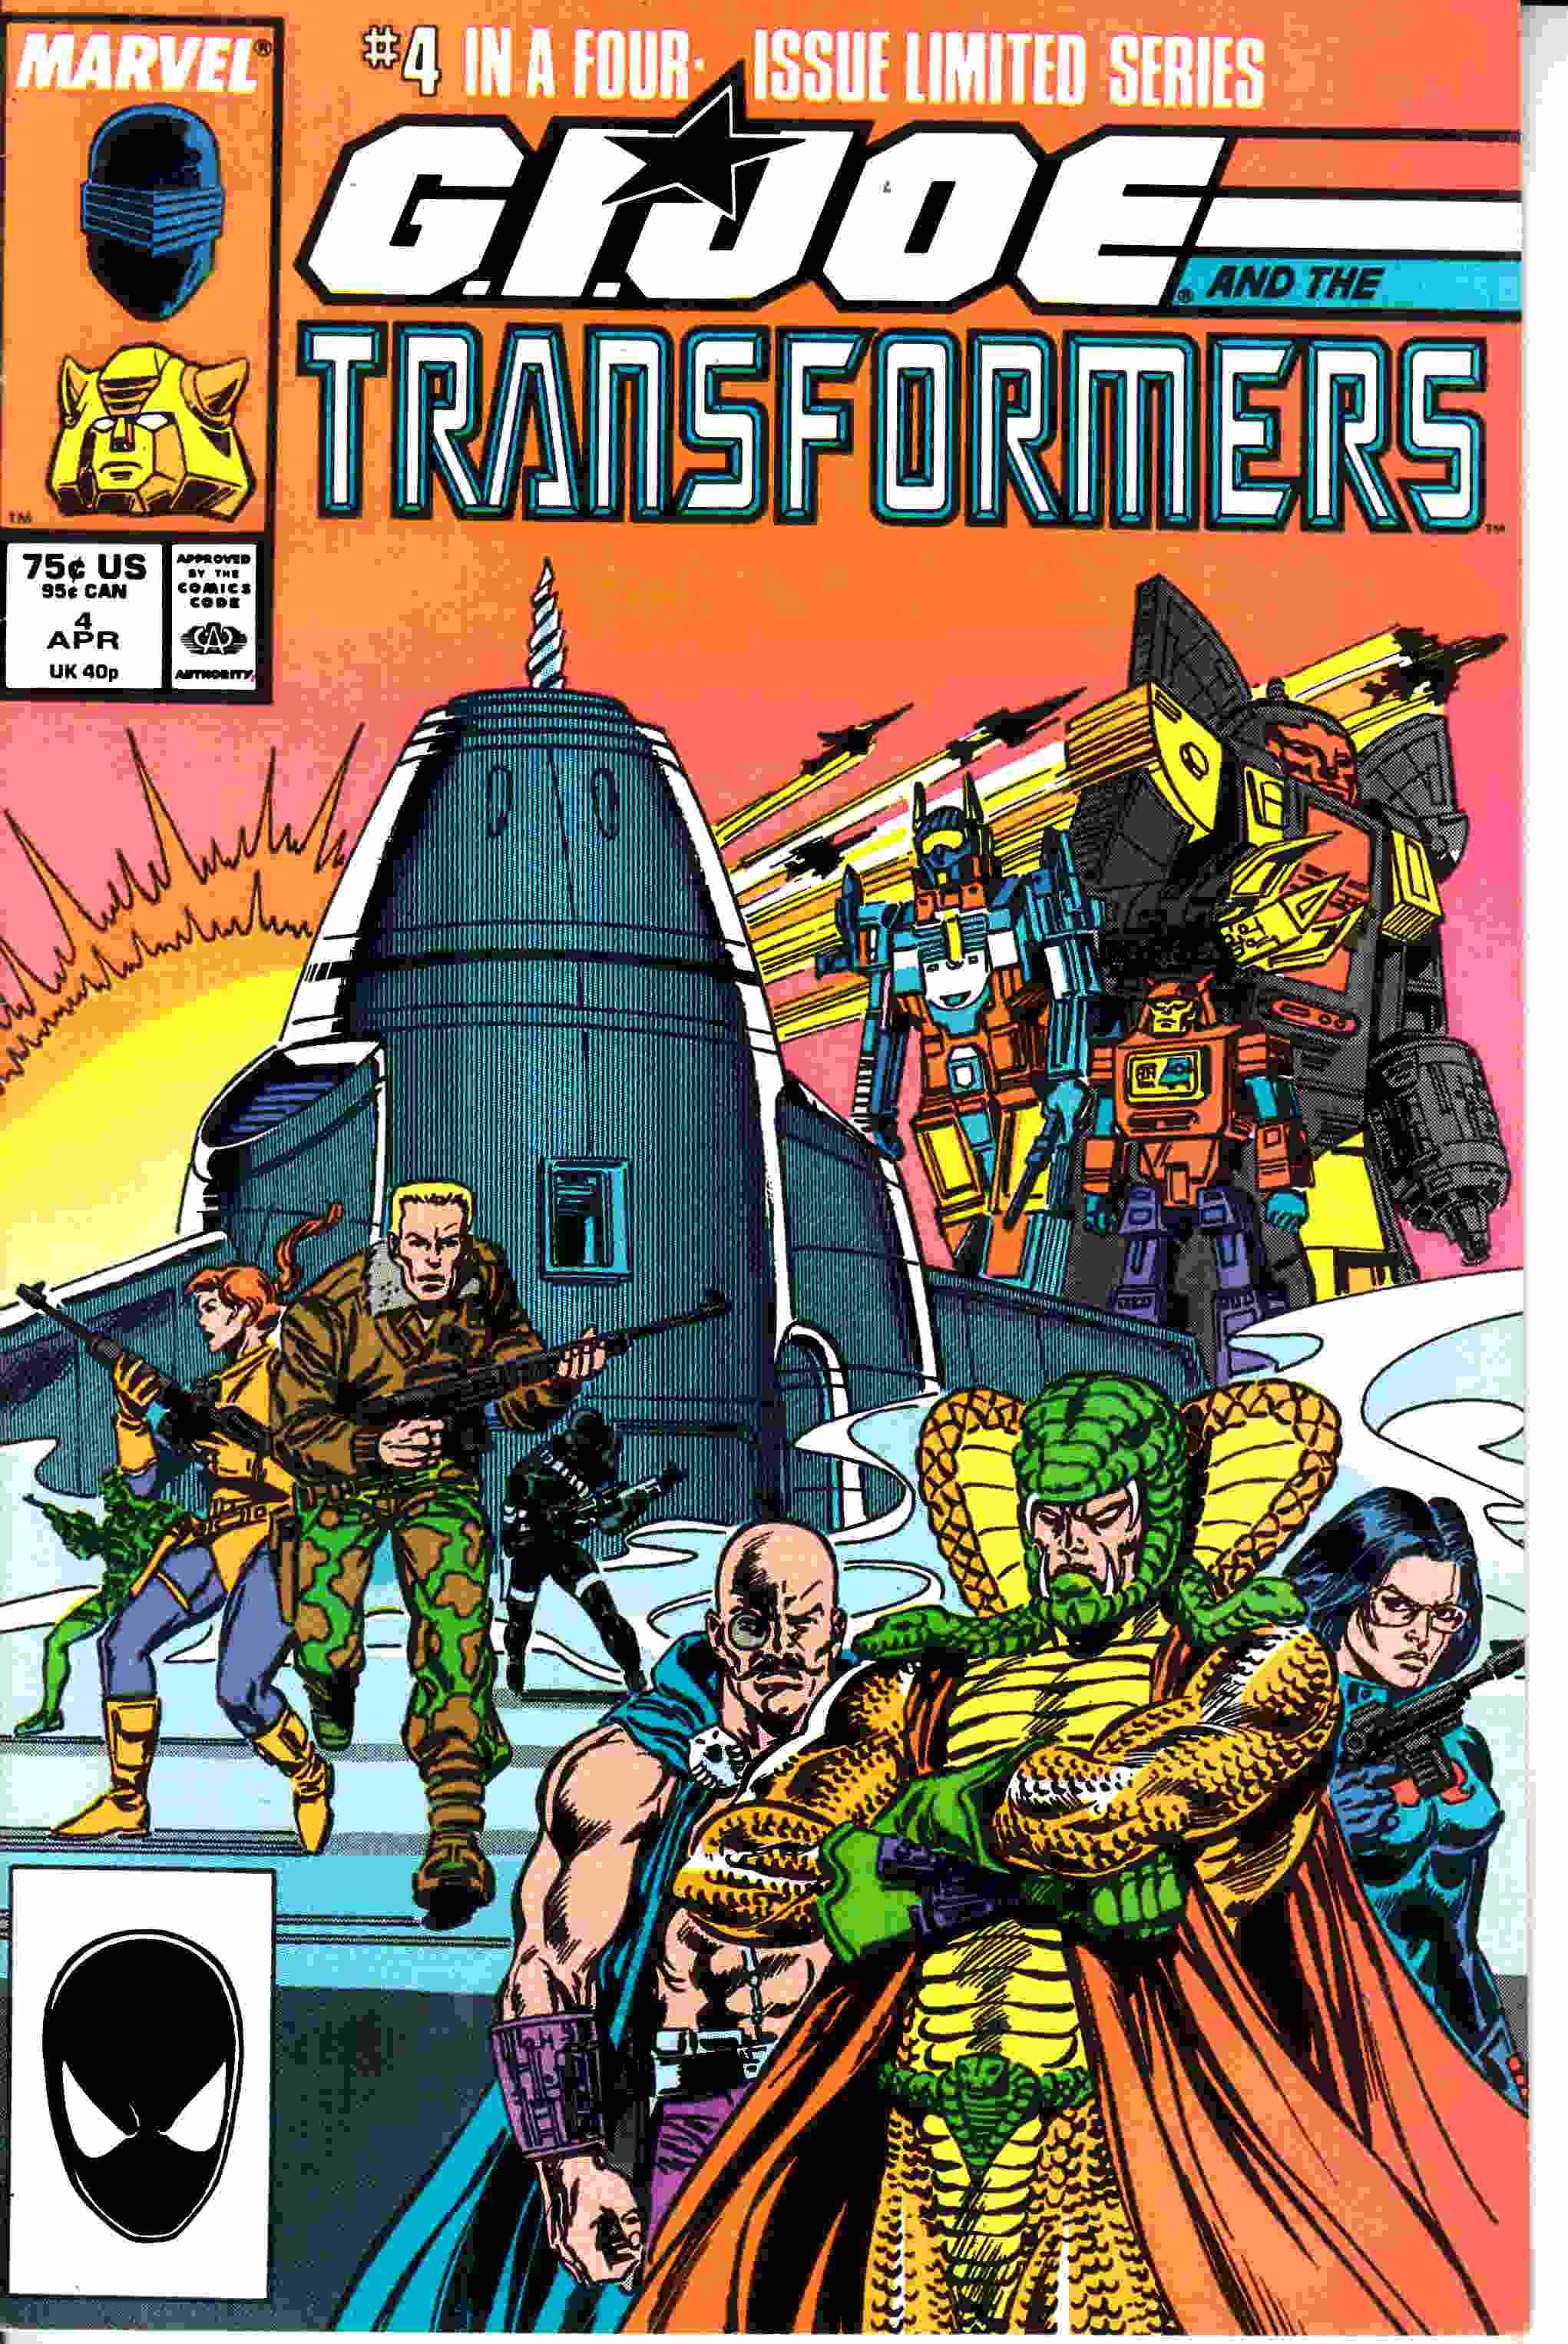 GI Joe and the Transformers #4 Very Fine (8.0) [Marvel Comic] –  Dreamlandcomics.com Online Store